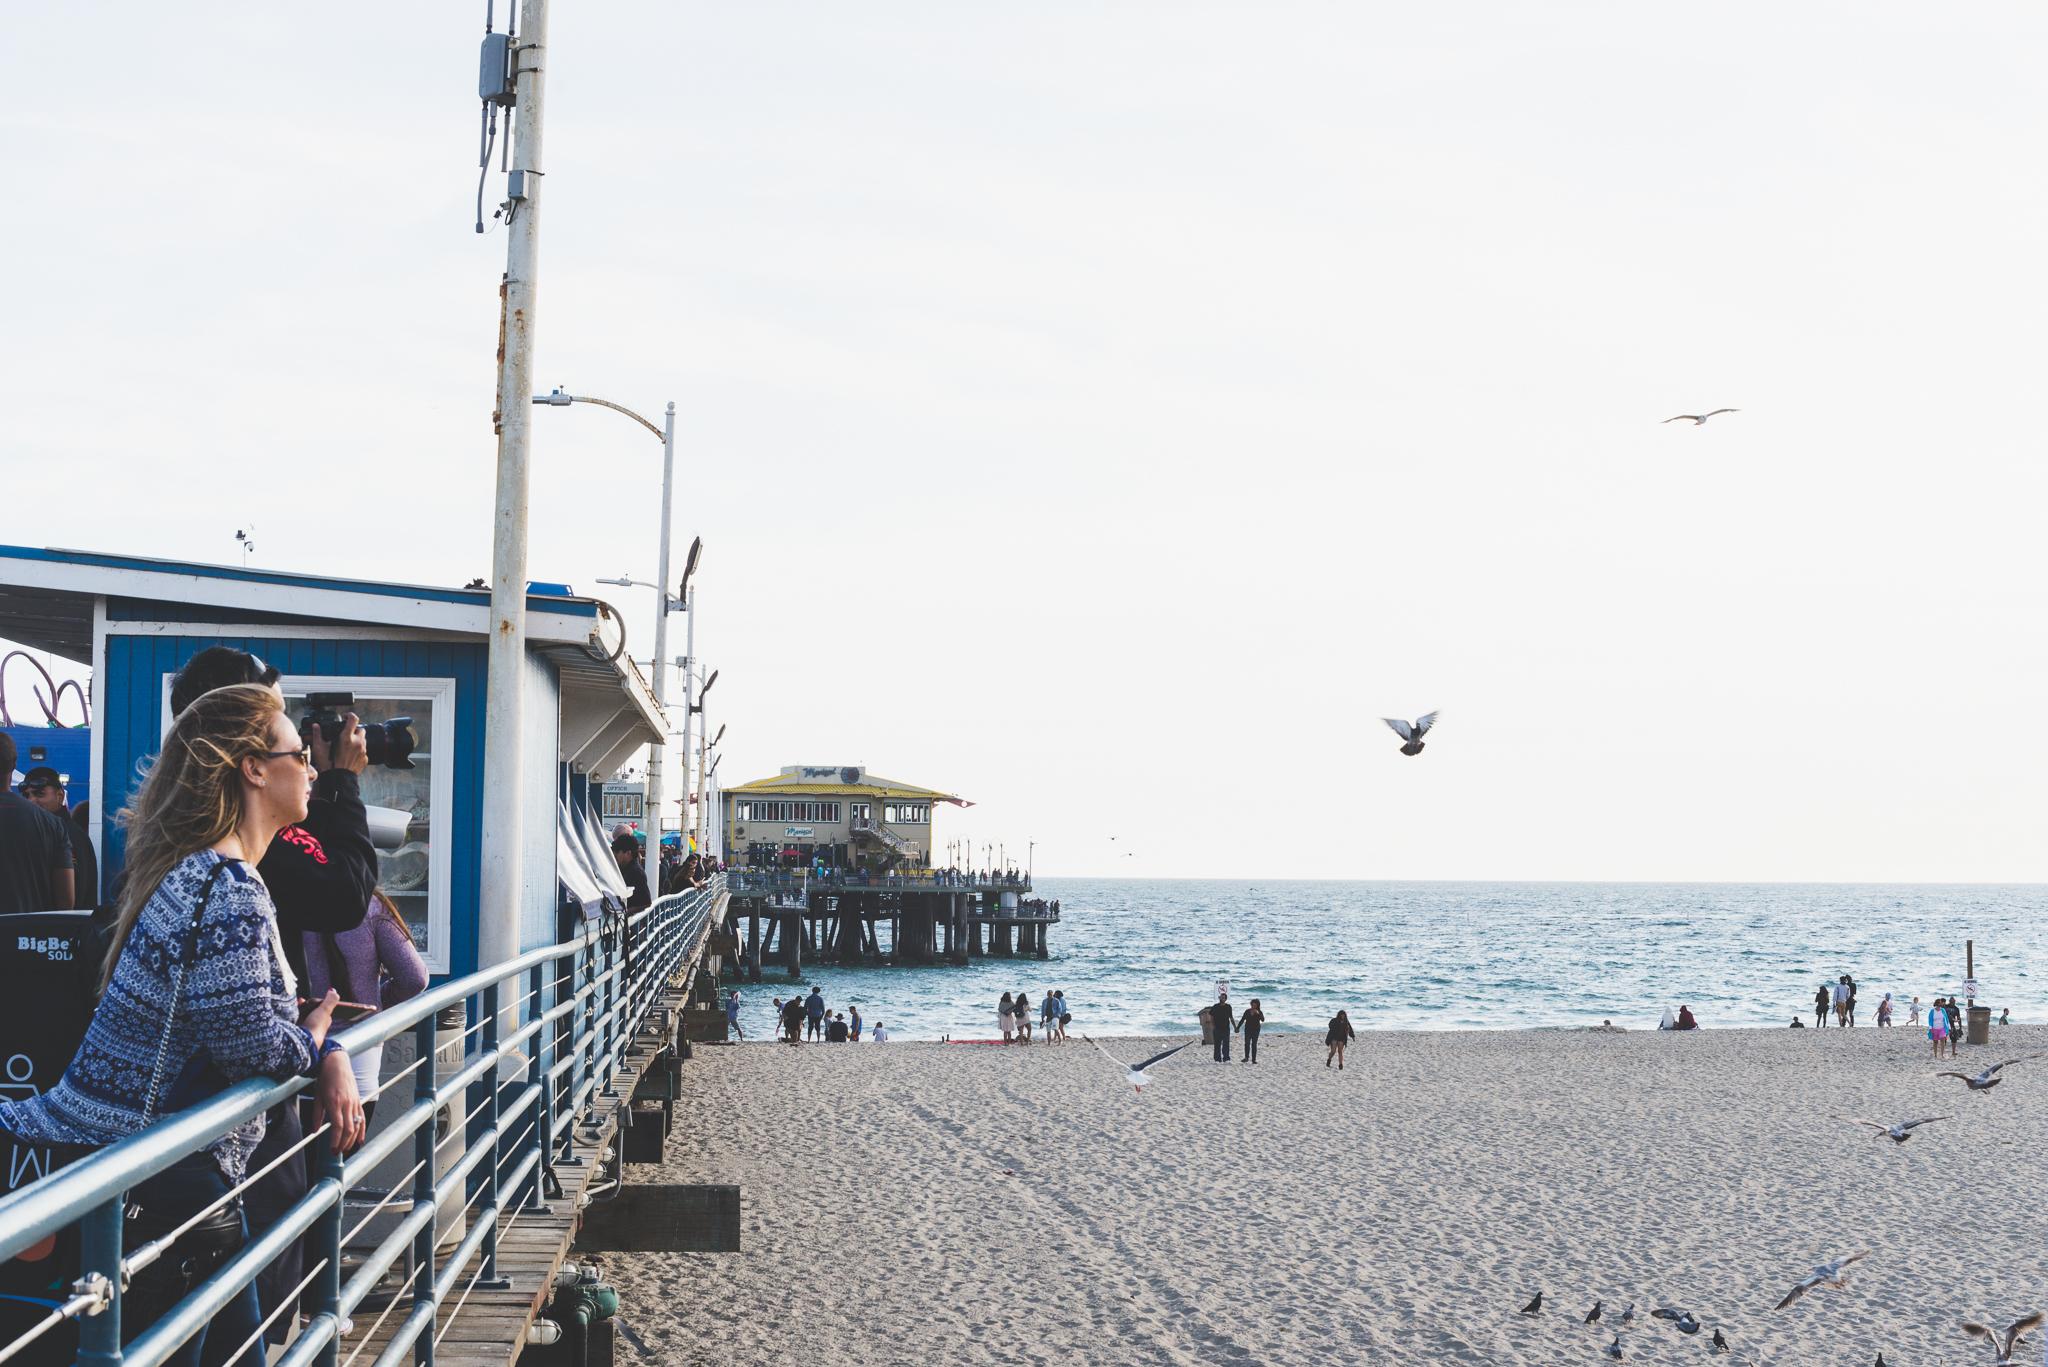 The Santa Monica Pier. / 5/7/16 / Santa Monica, CA